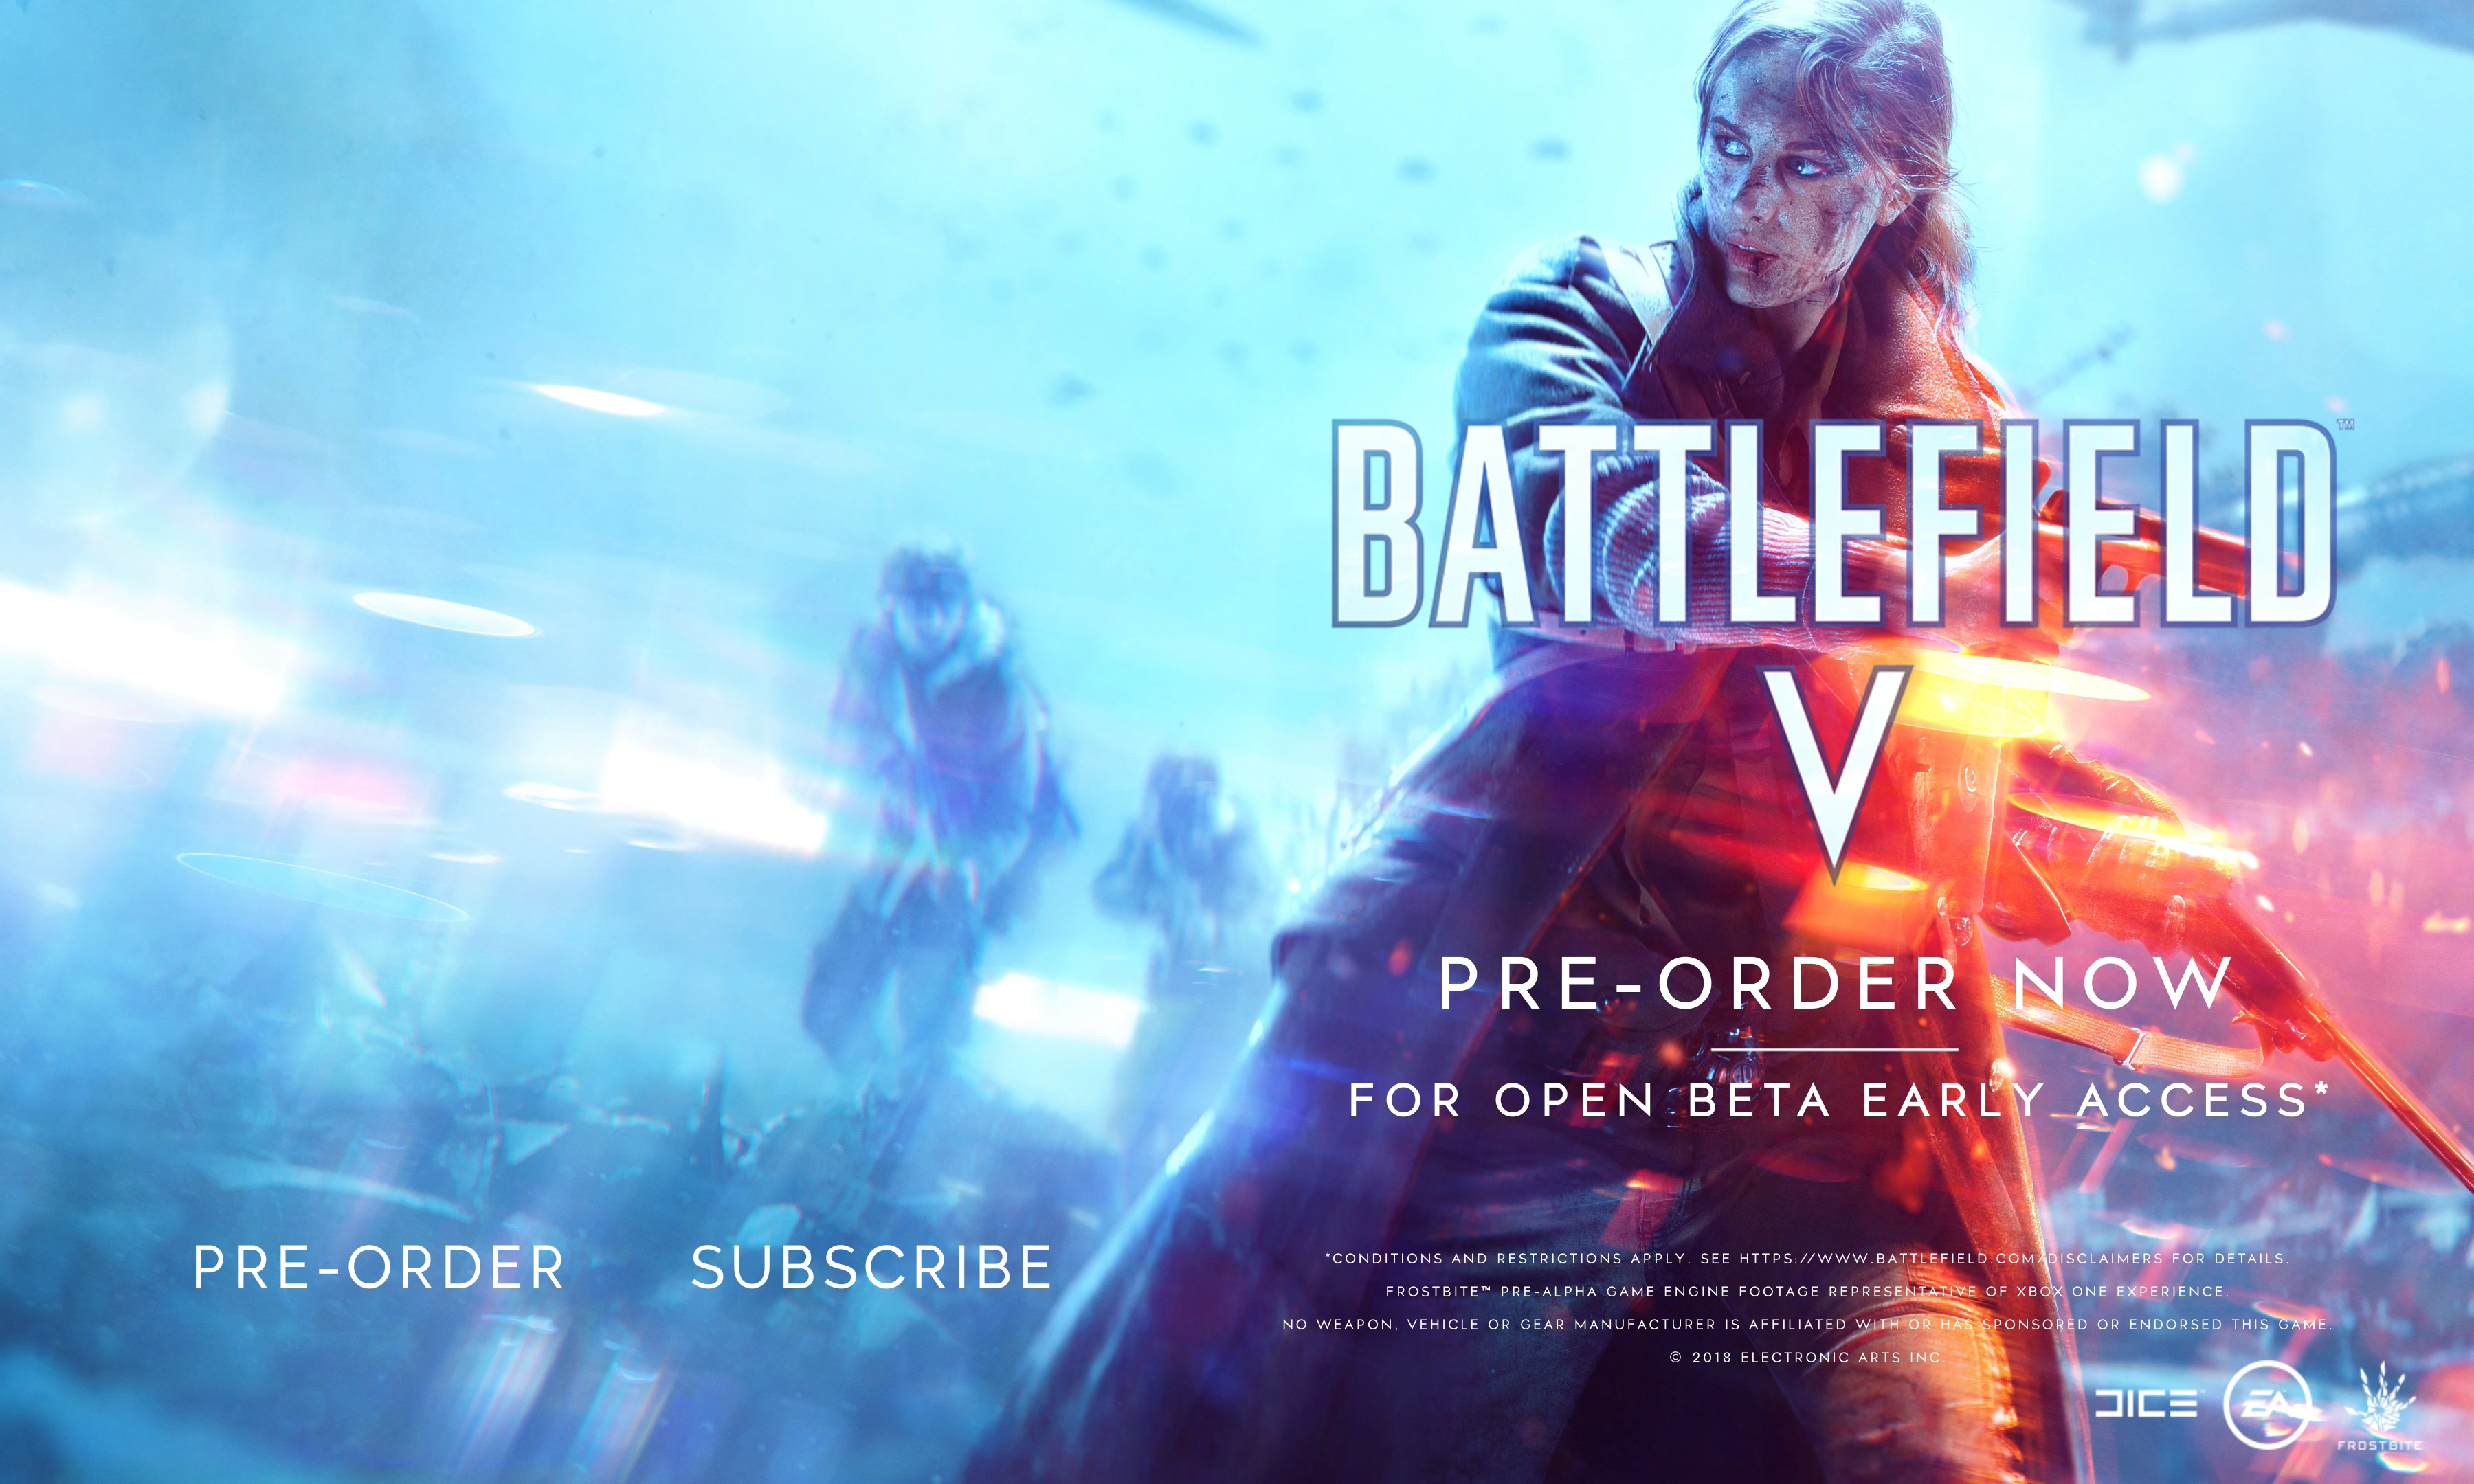 E3 游戏展首日,EA 发布《战地5》、《FIFA 19》等 9 款新游戏